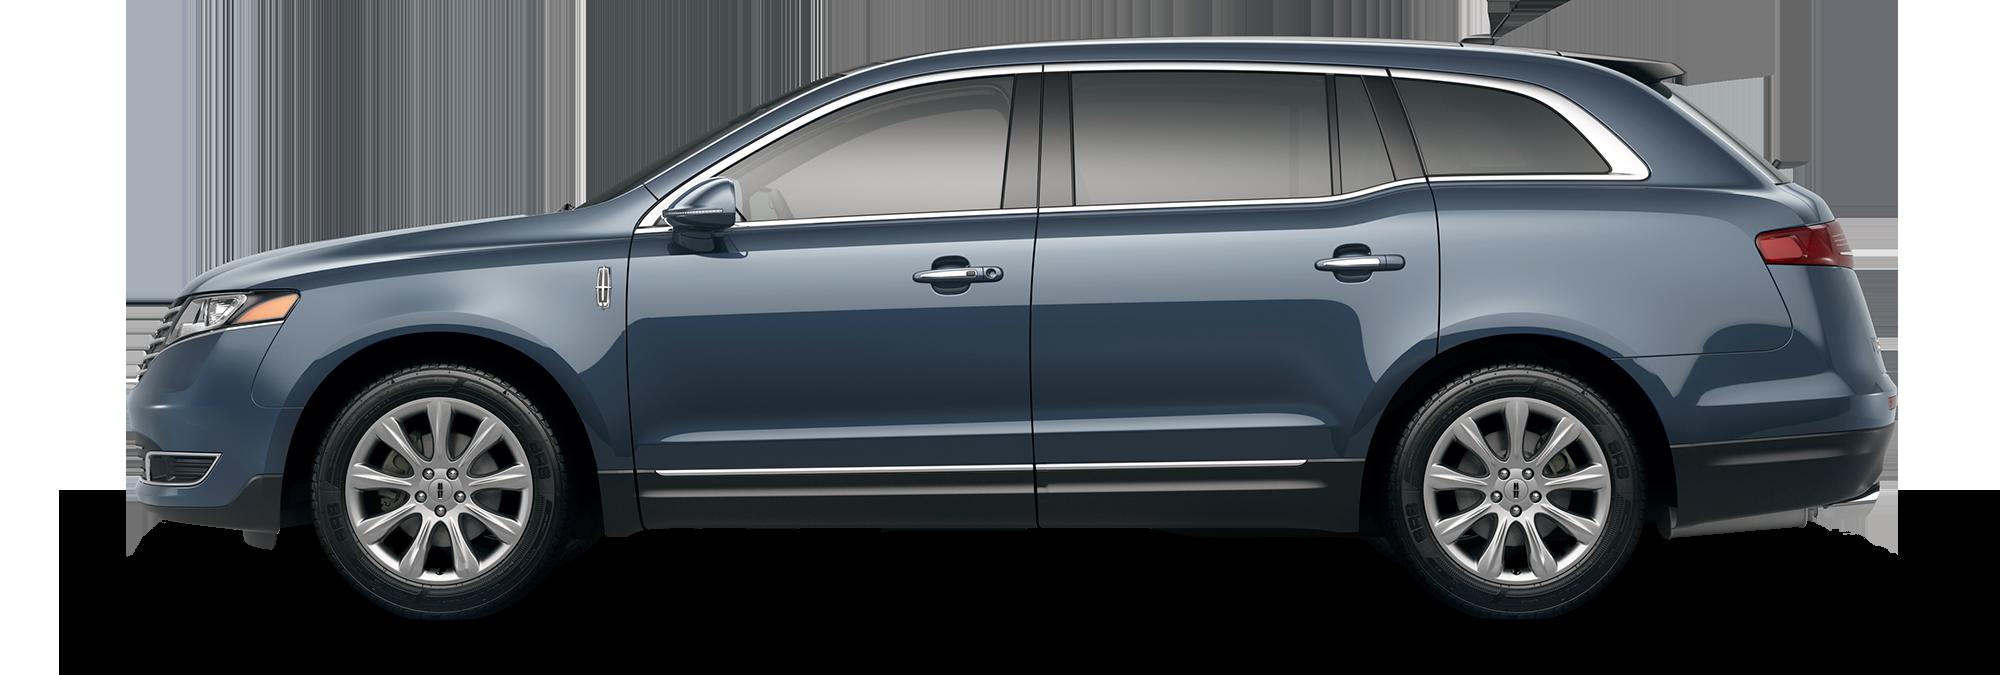 2019 Lincoln MKT SUV Standard